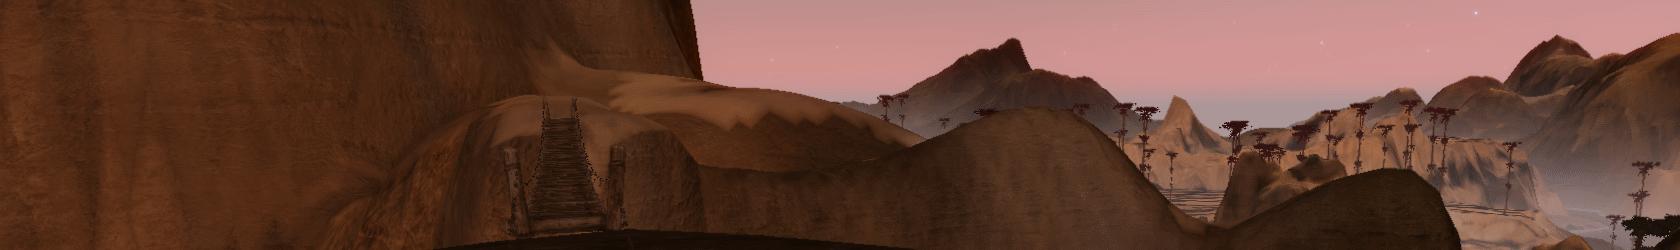 Narrow bridge across a deep ravine between arid tan peaks.